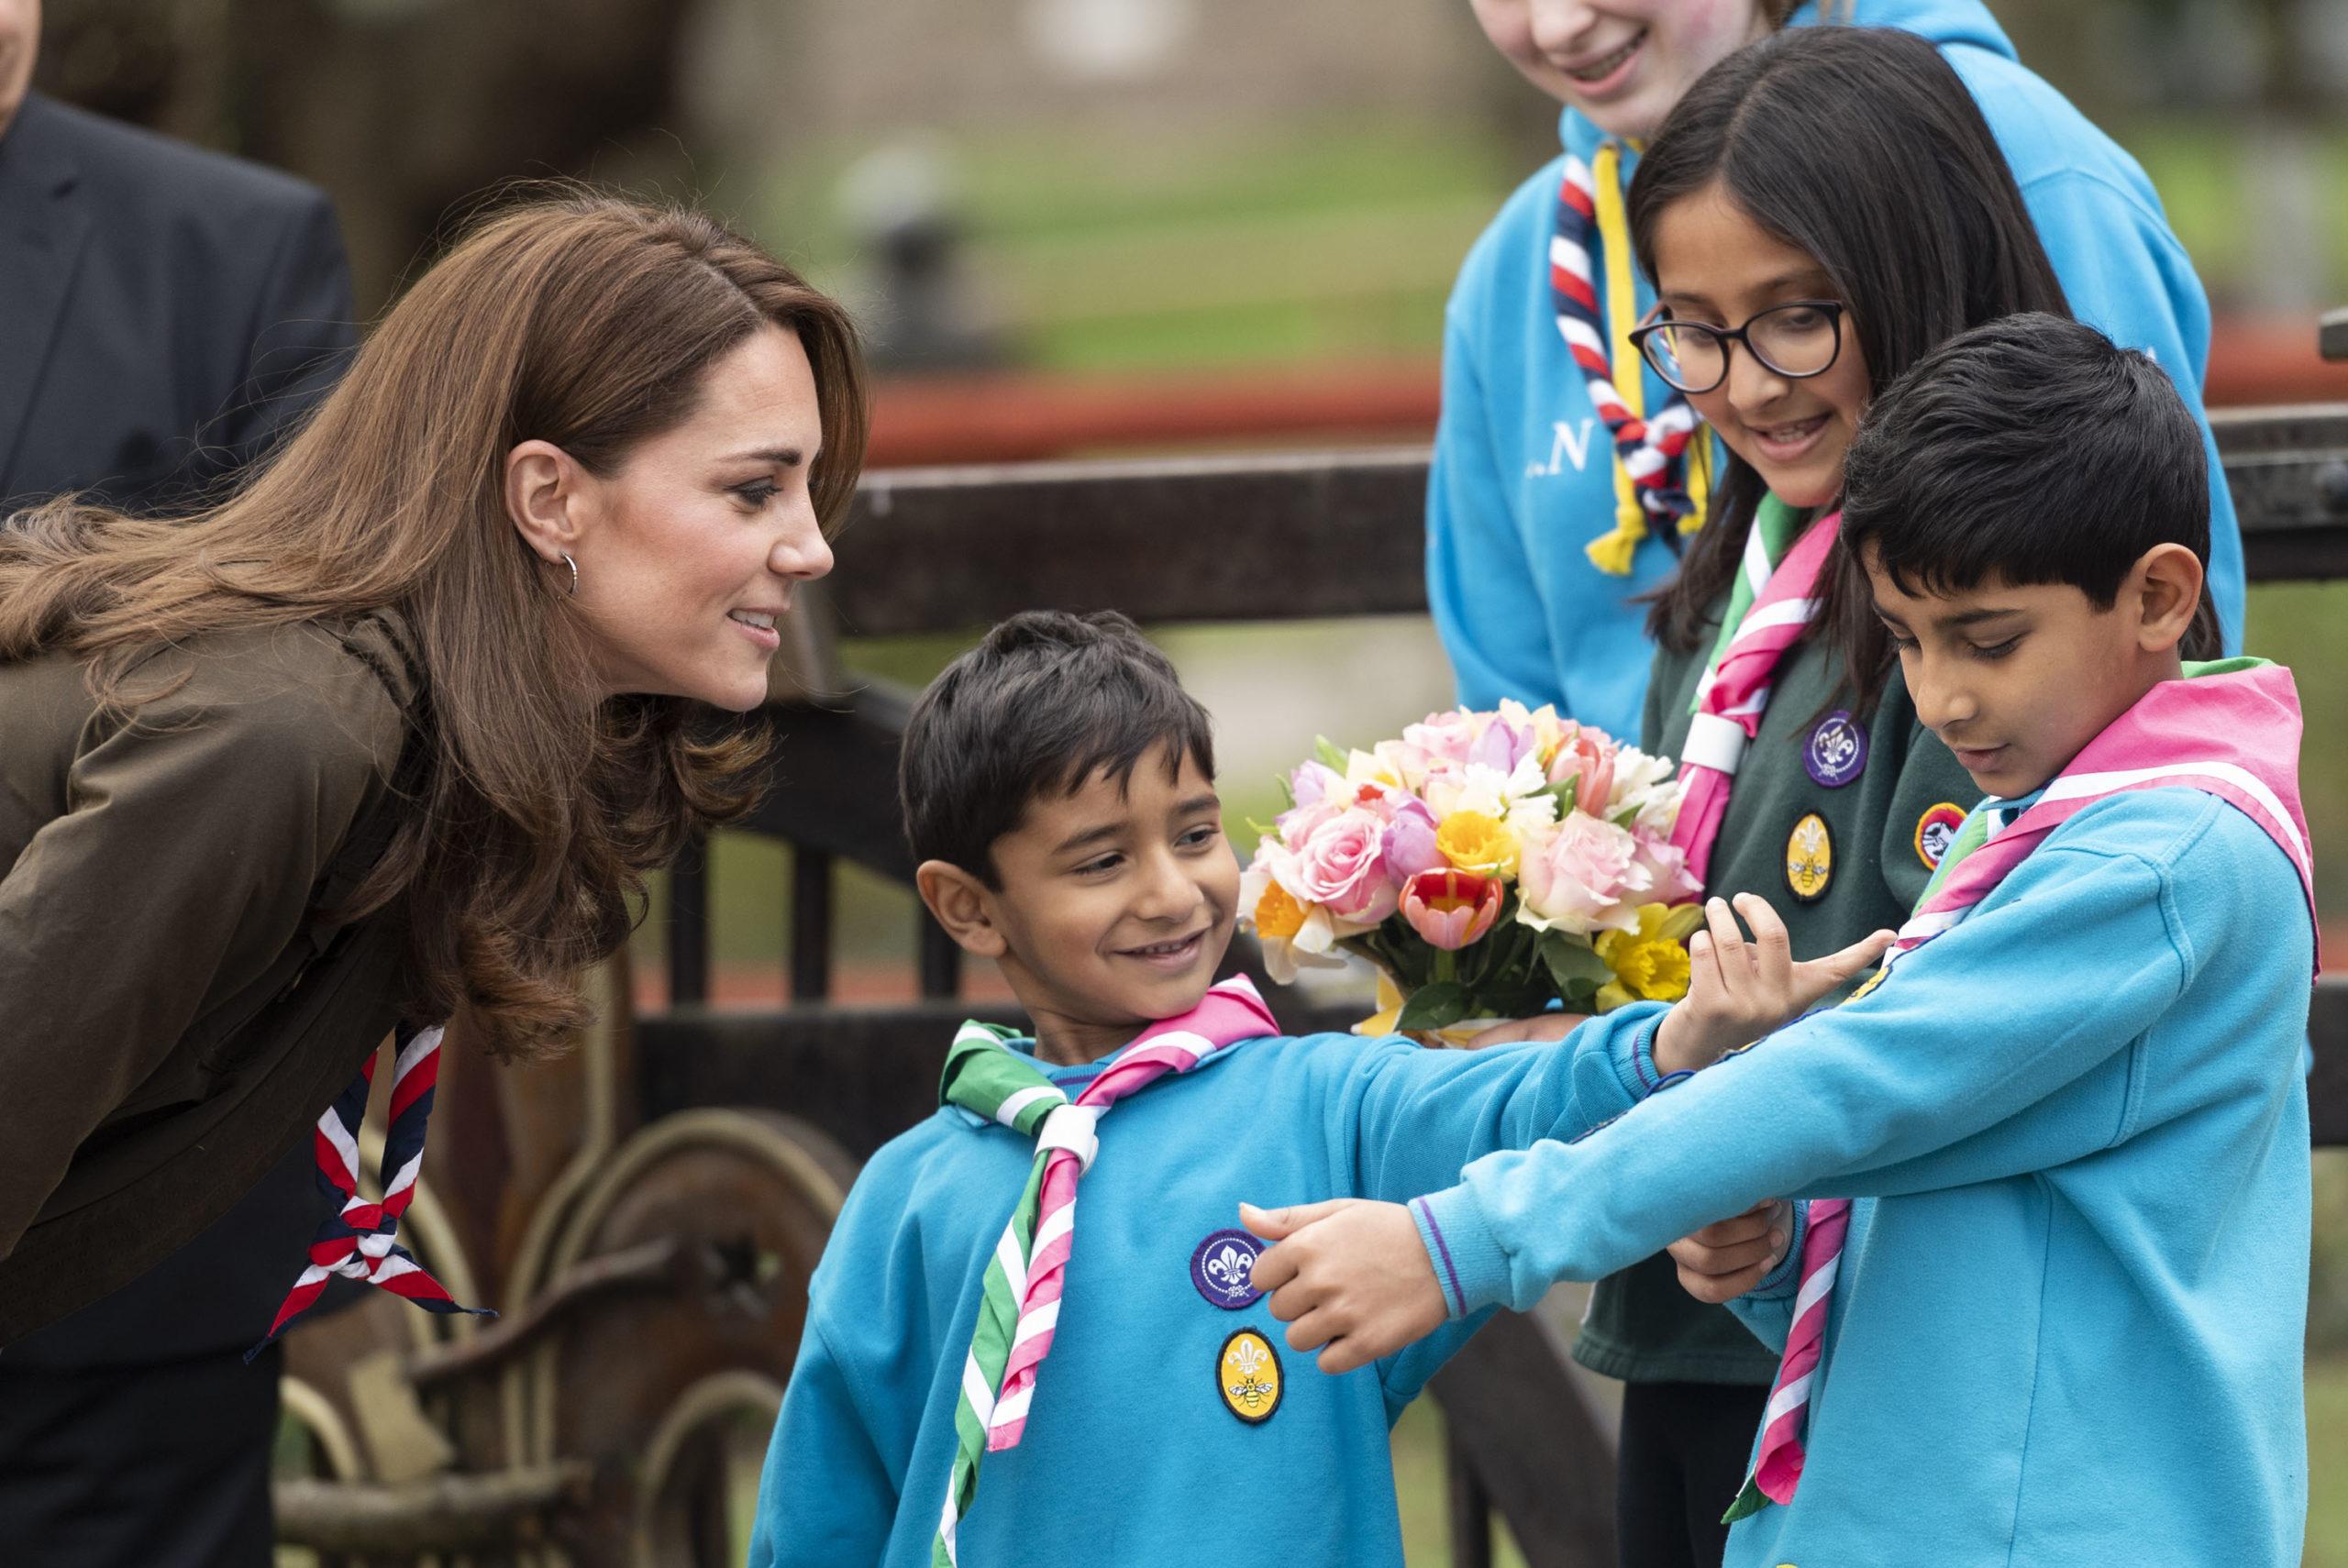 Kate Middleton e il look scout riciclato